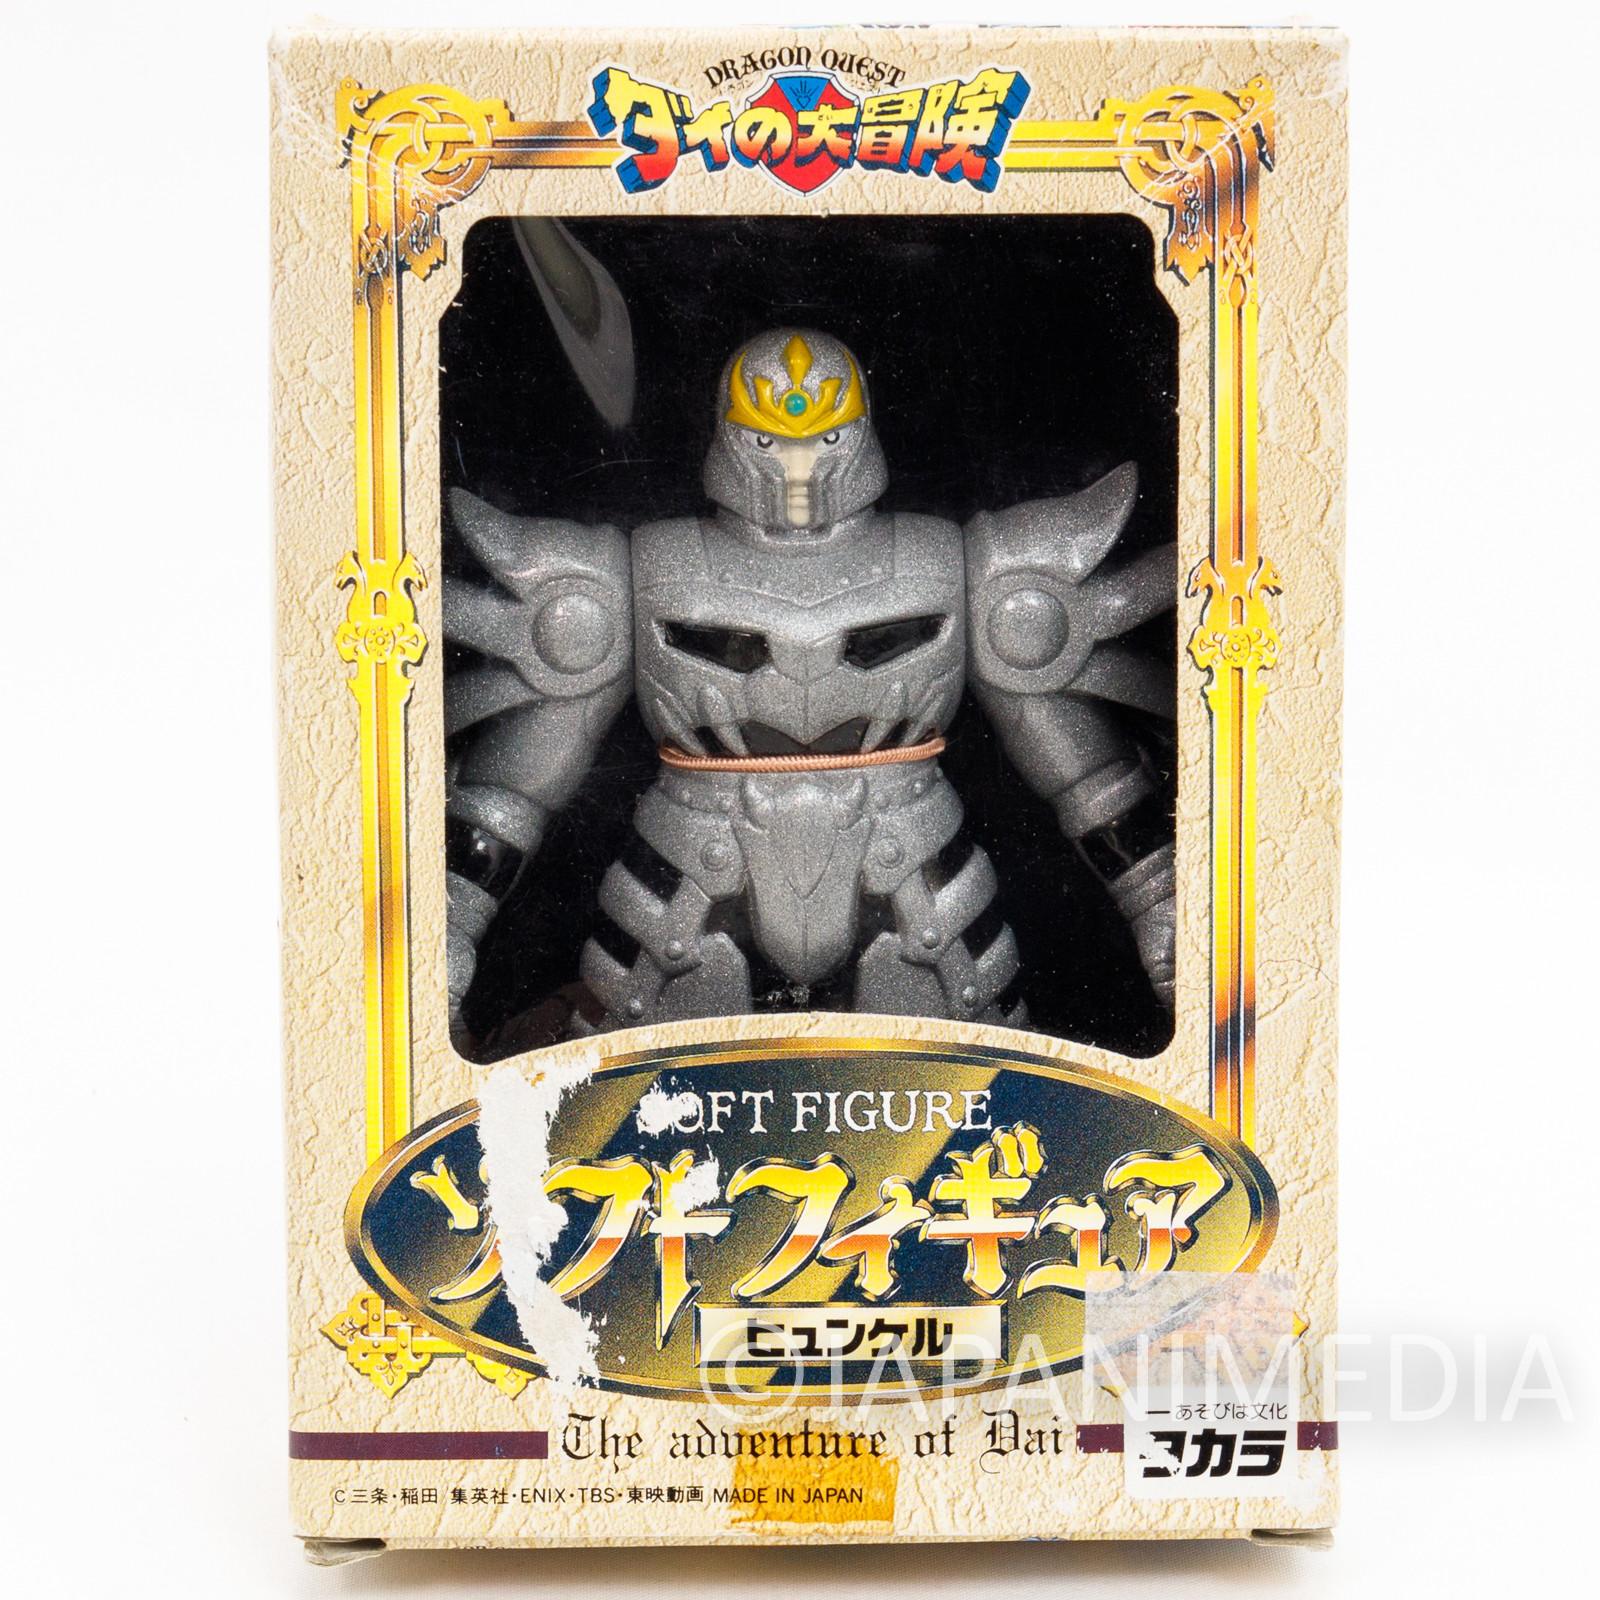 Dragon Quest: The Adventure of Dai Hyunckel Soft Figure TAKARA JAPAN ANIME